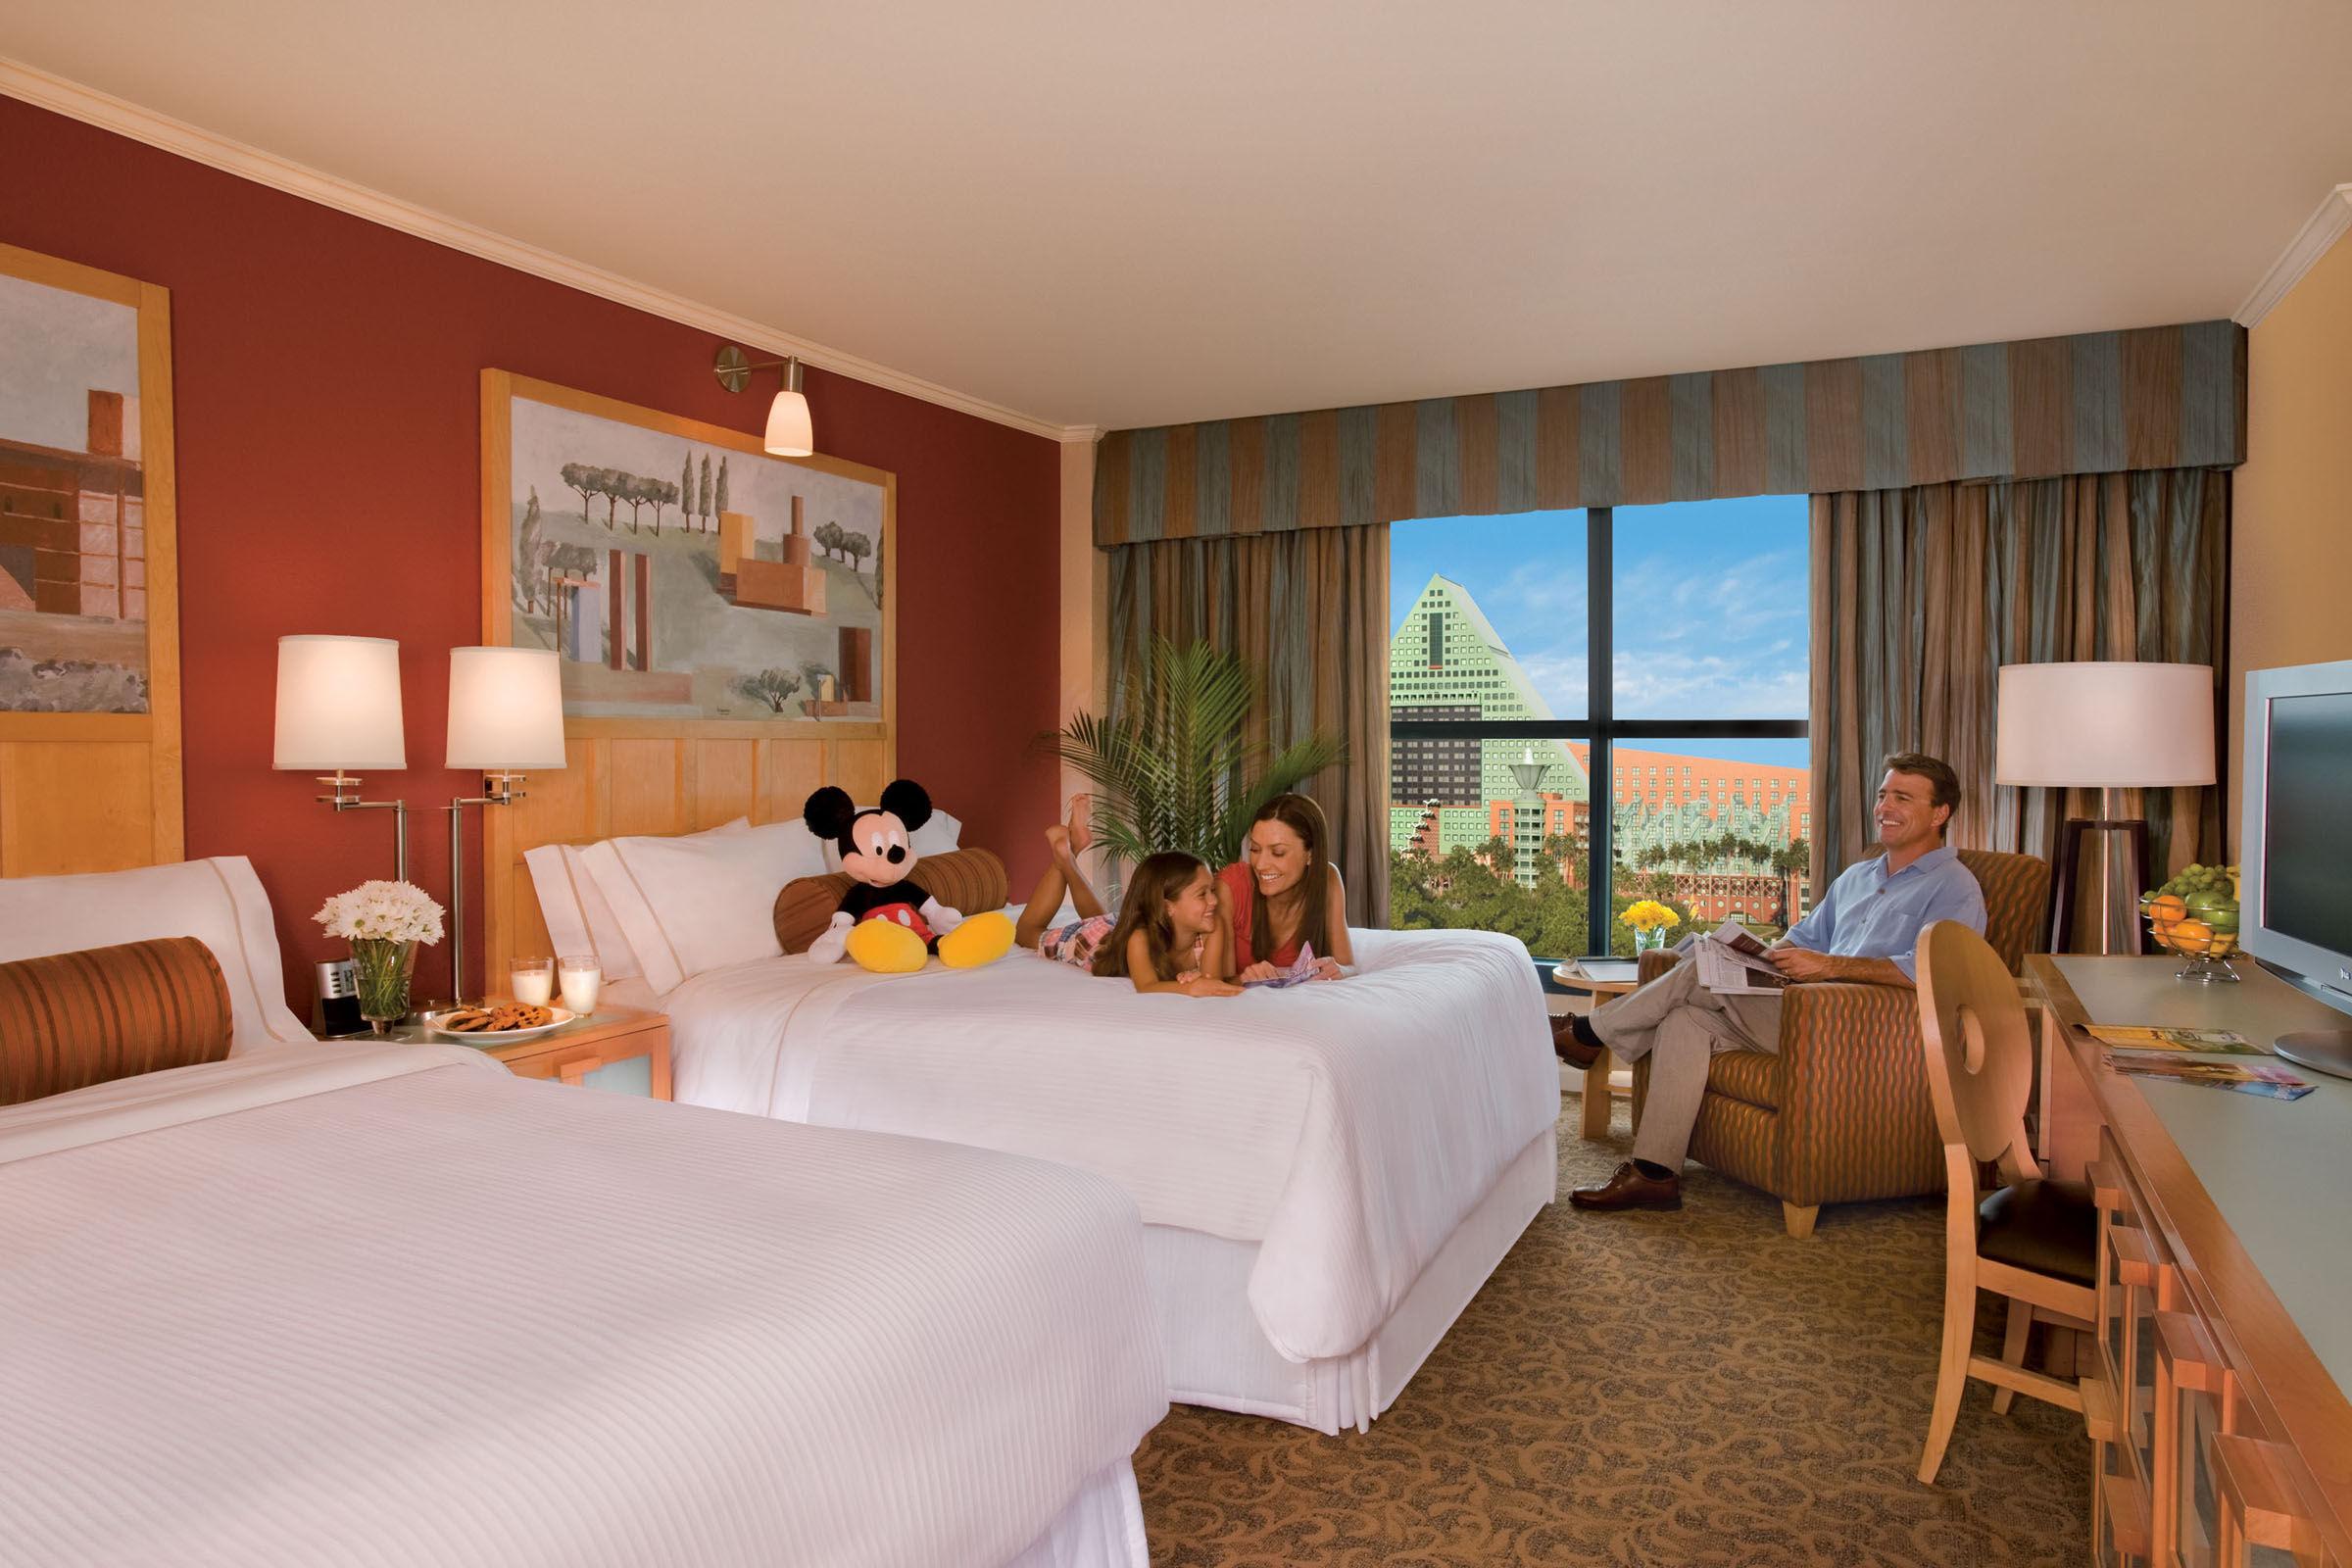 Peachy The Starwood Swan And Dolphin Hotel At Walt Disney World Download Free Architecture Designs Rallybritishbridgeorg